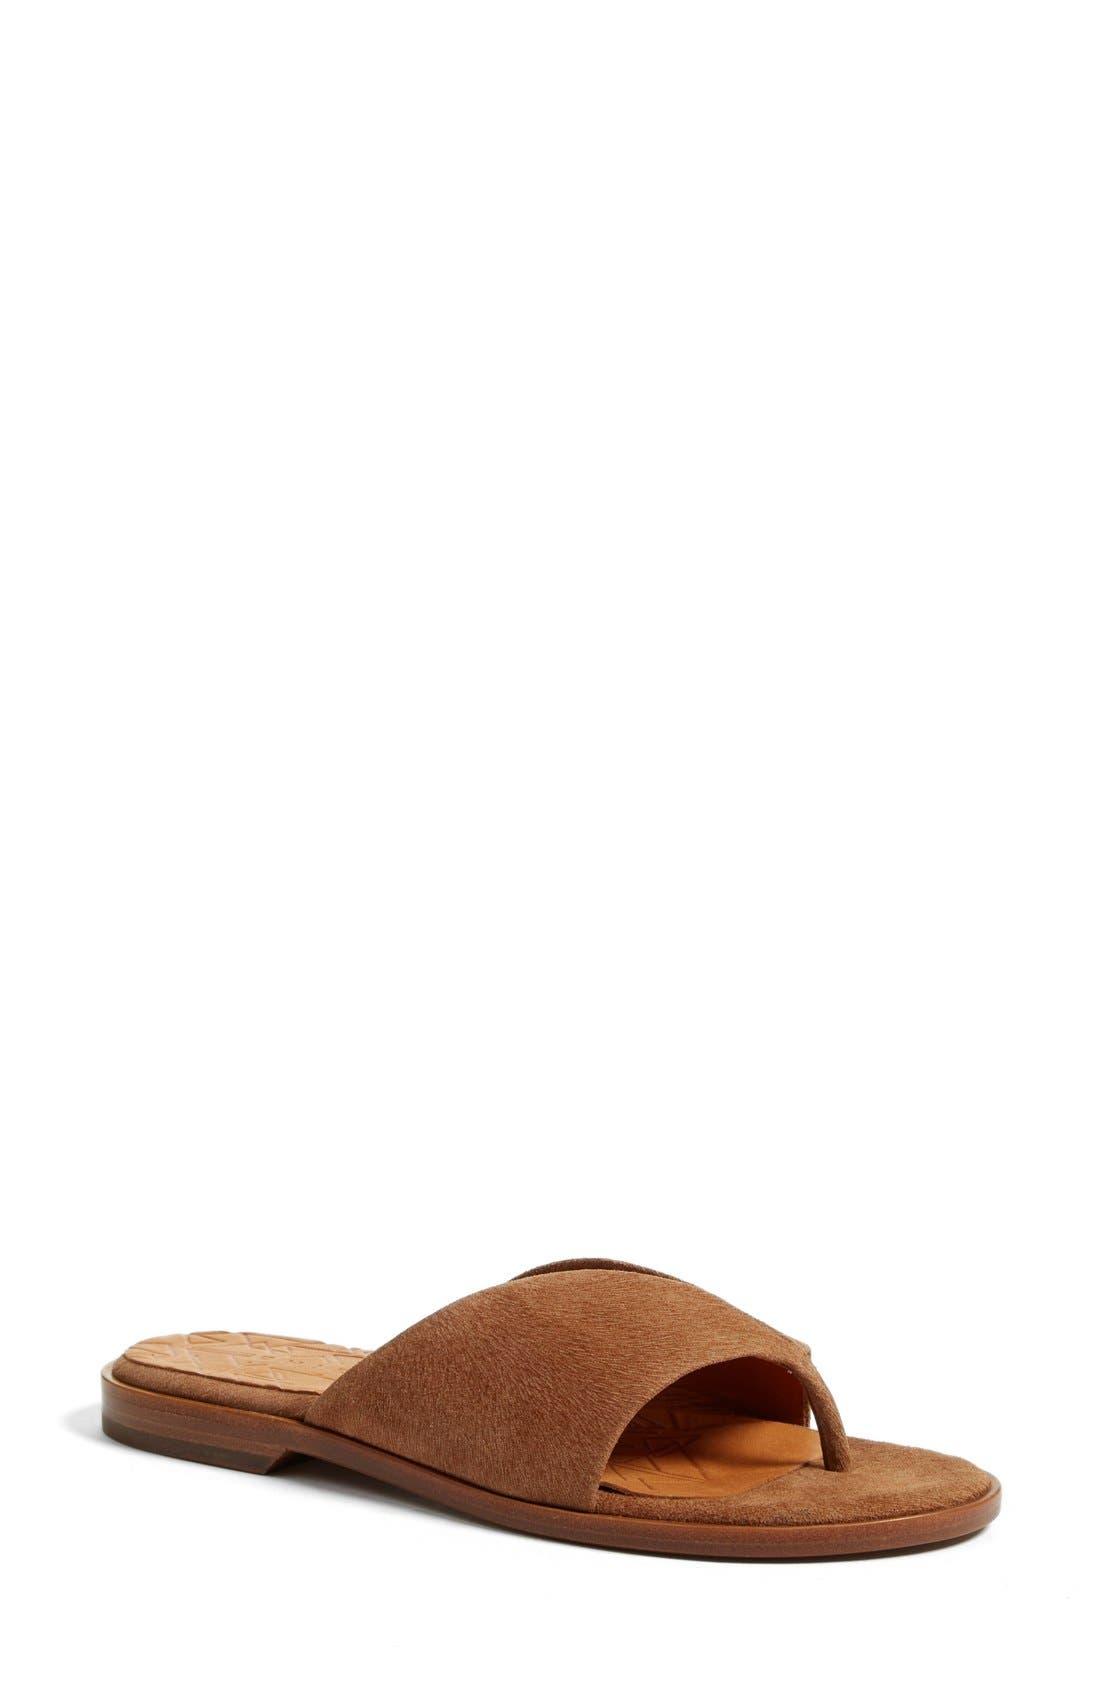 Alternate Image 1 Selected - Chie Mihara Quepa Flip Flop (Women)